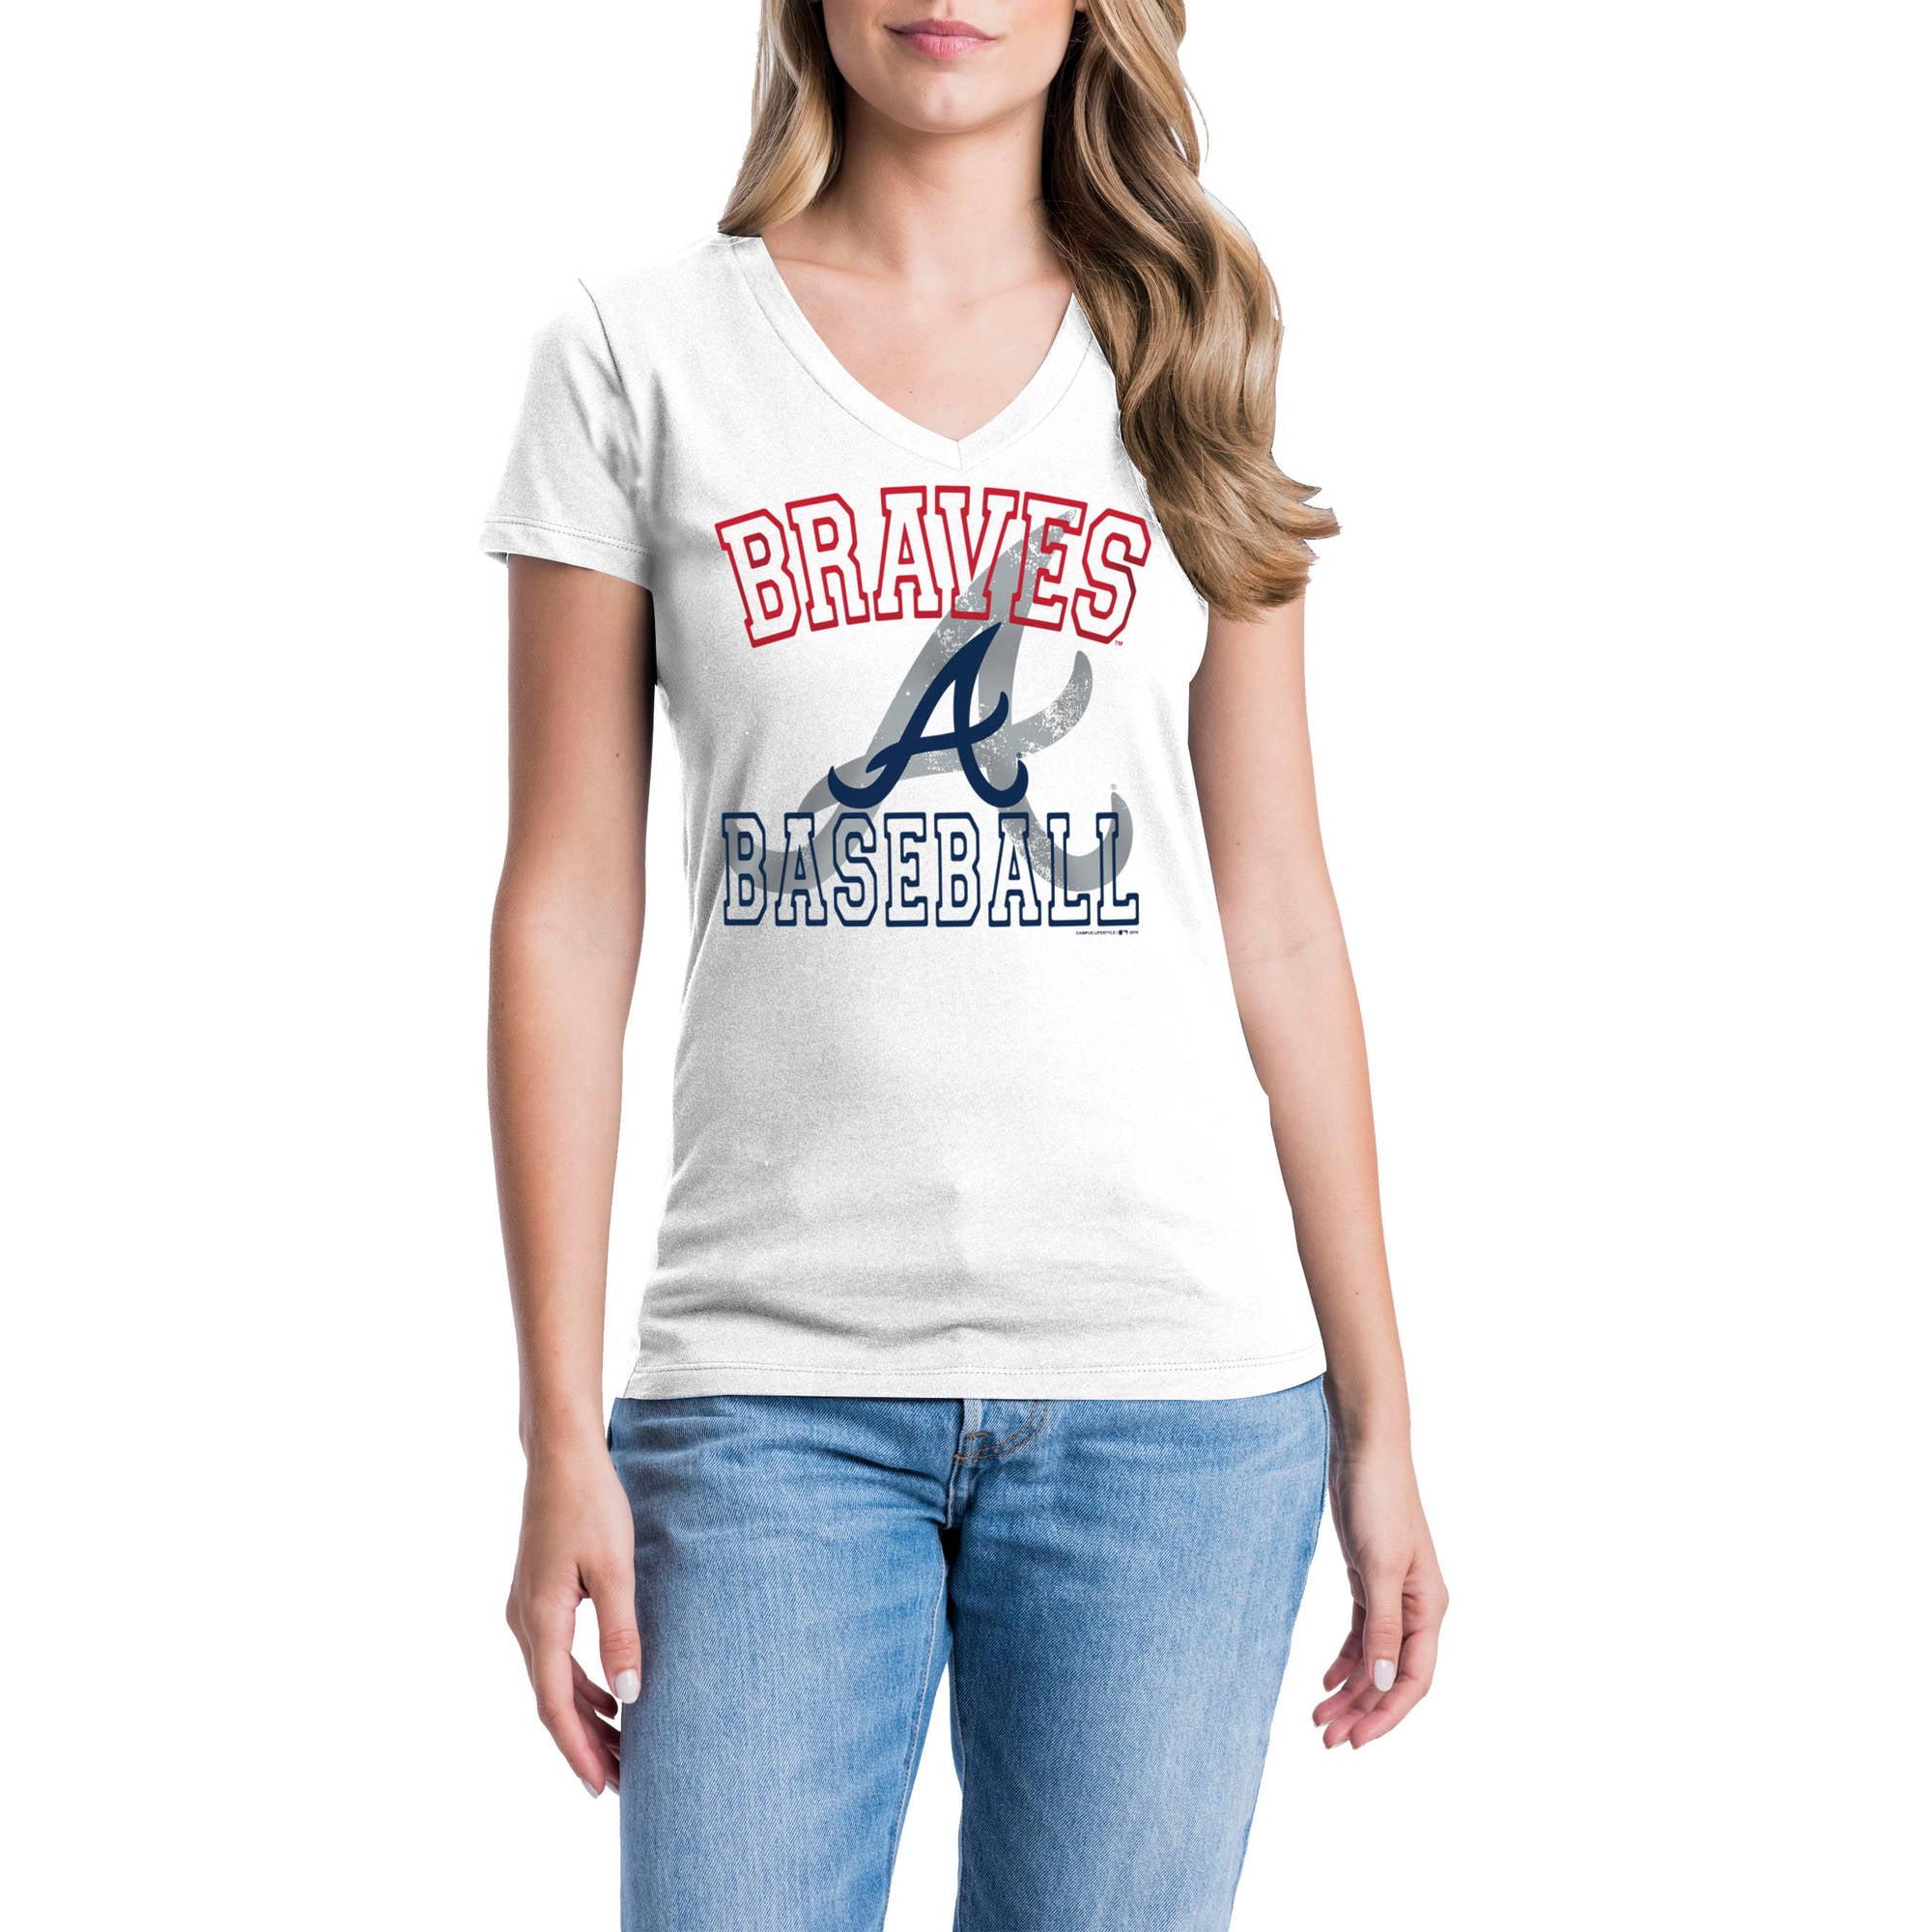 Atlanta Braves Womens Short Sleeve Graphic Tee